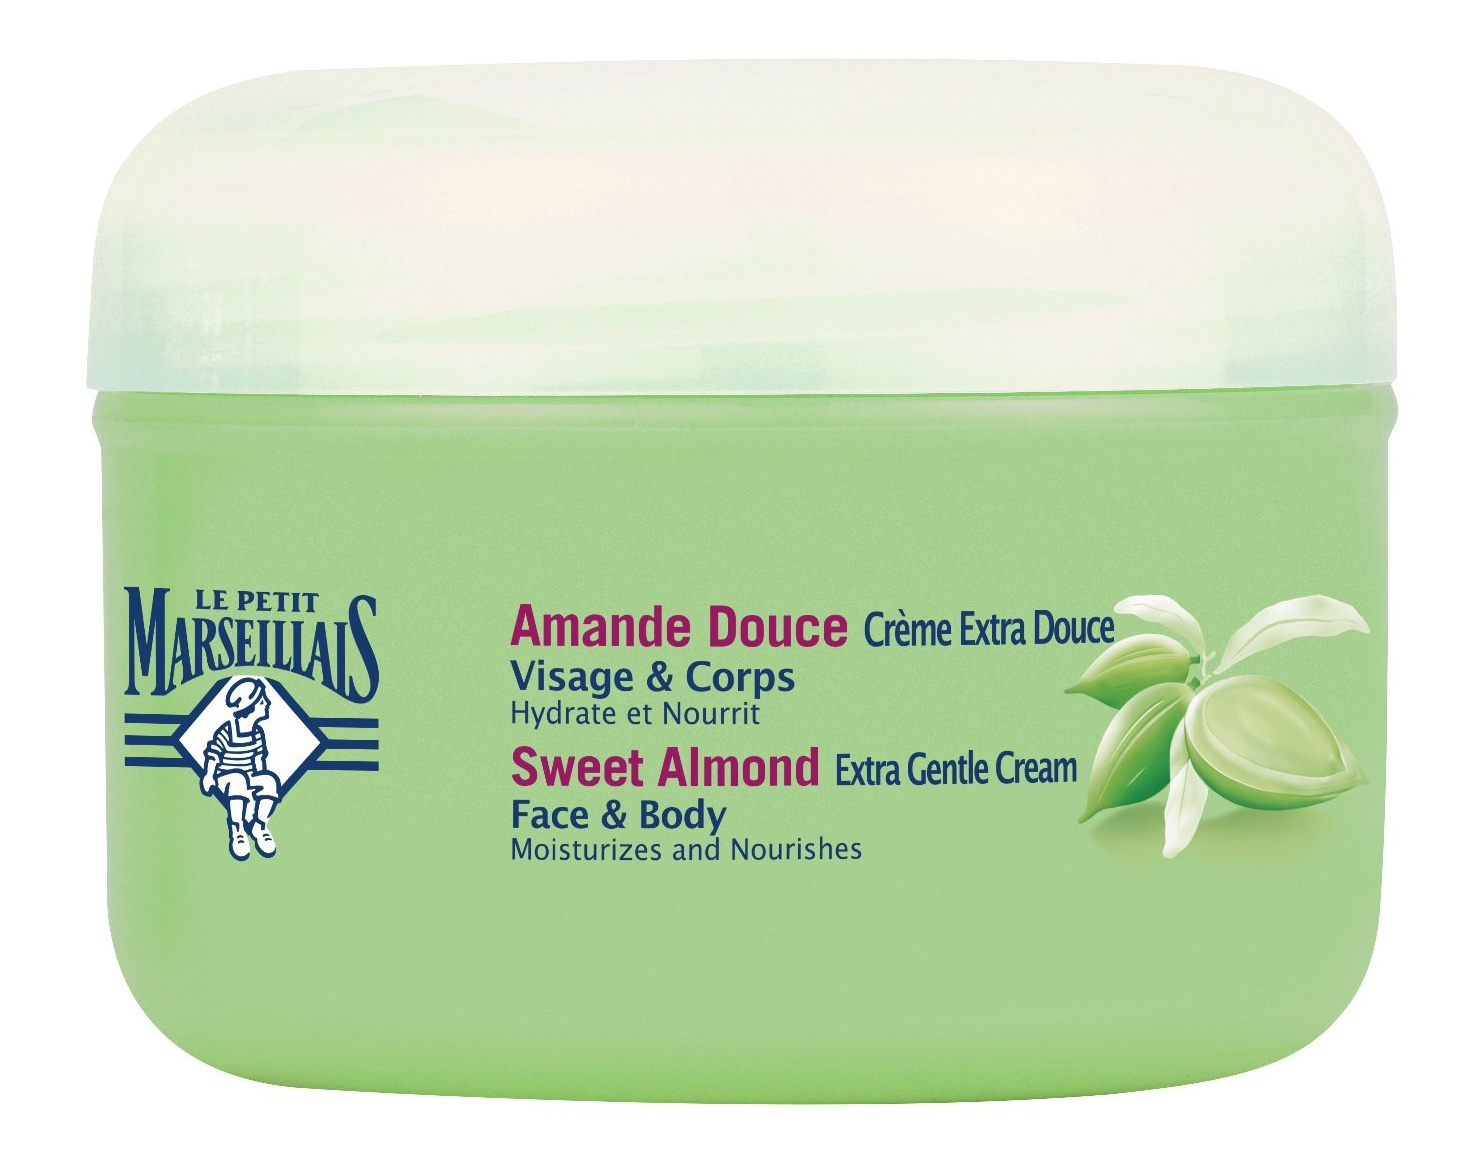 Le Petit Marseillais Extra Gentle Cream Sweet Almond Face & Body